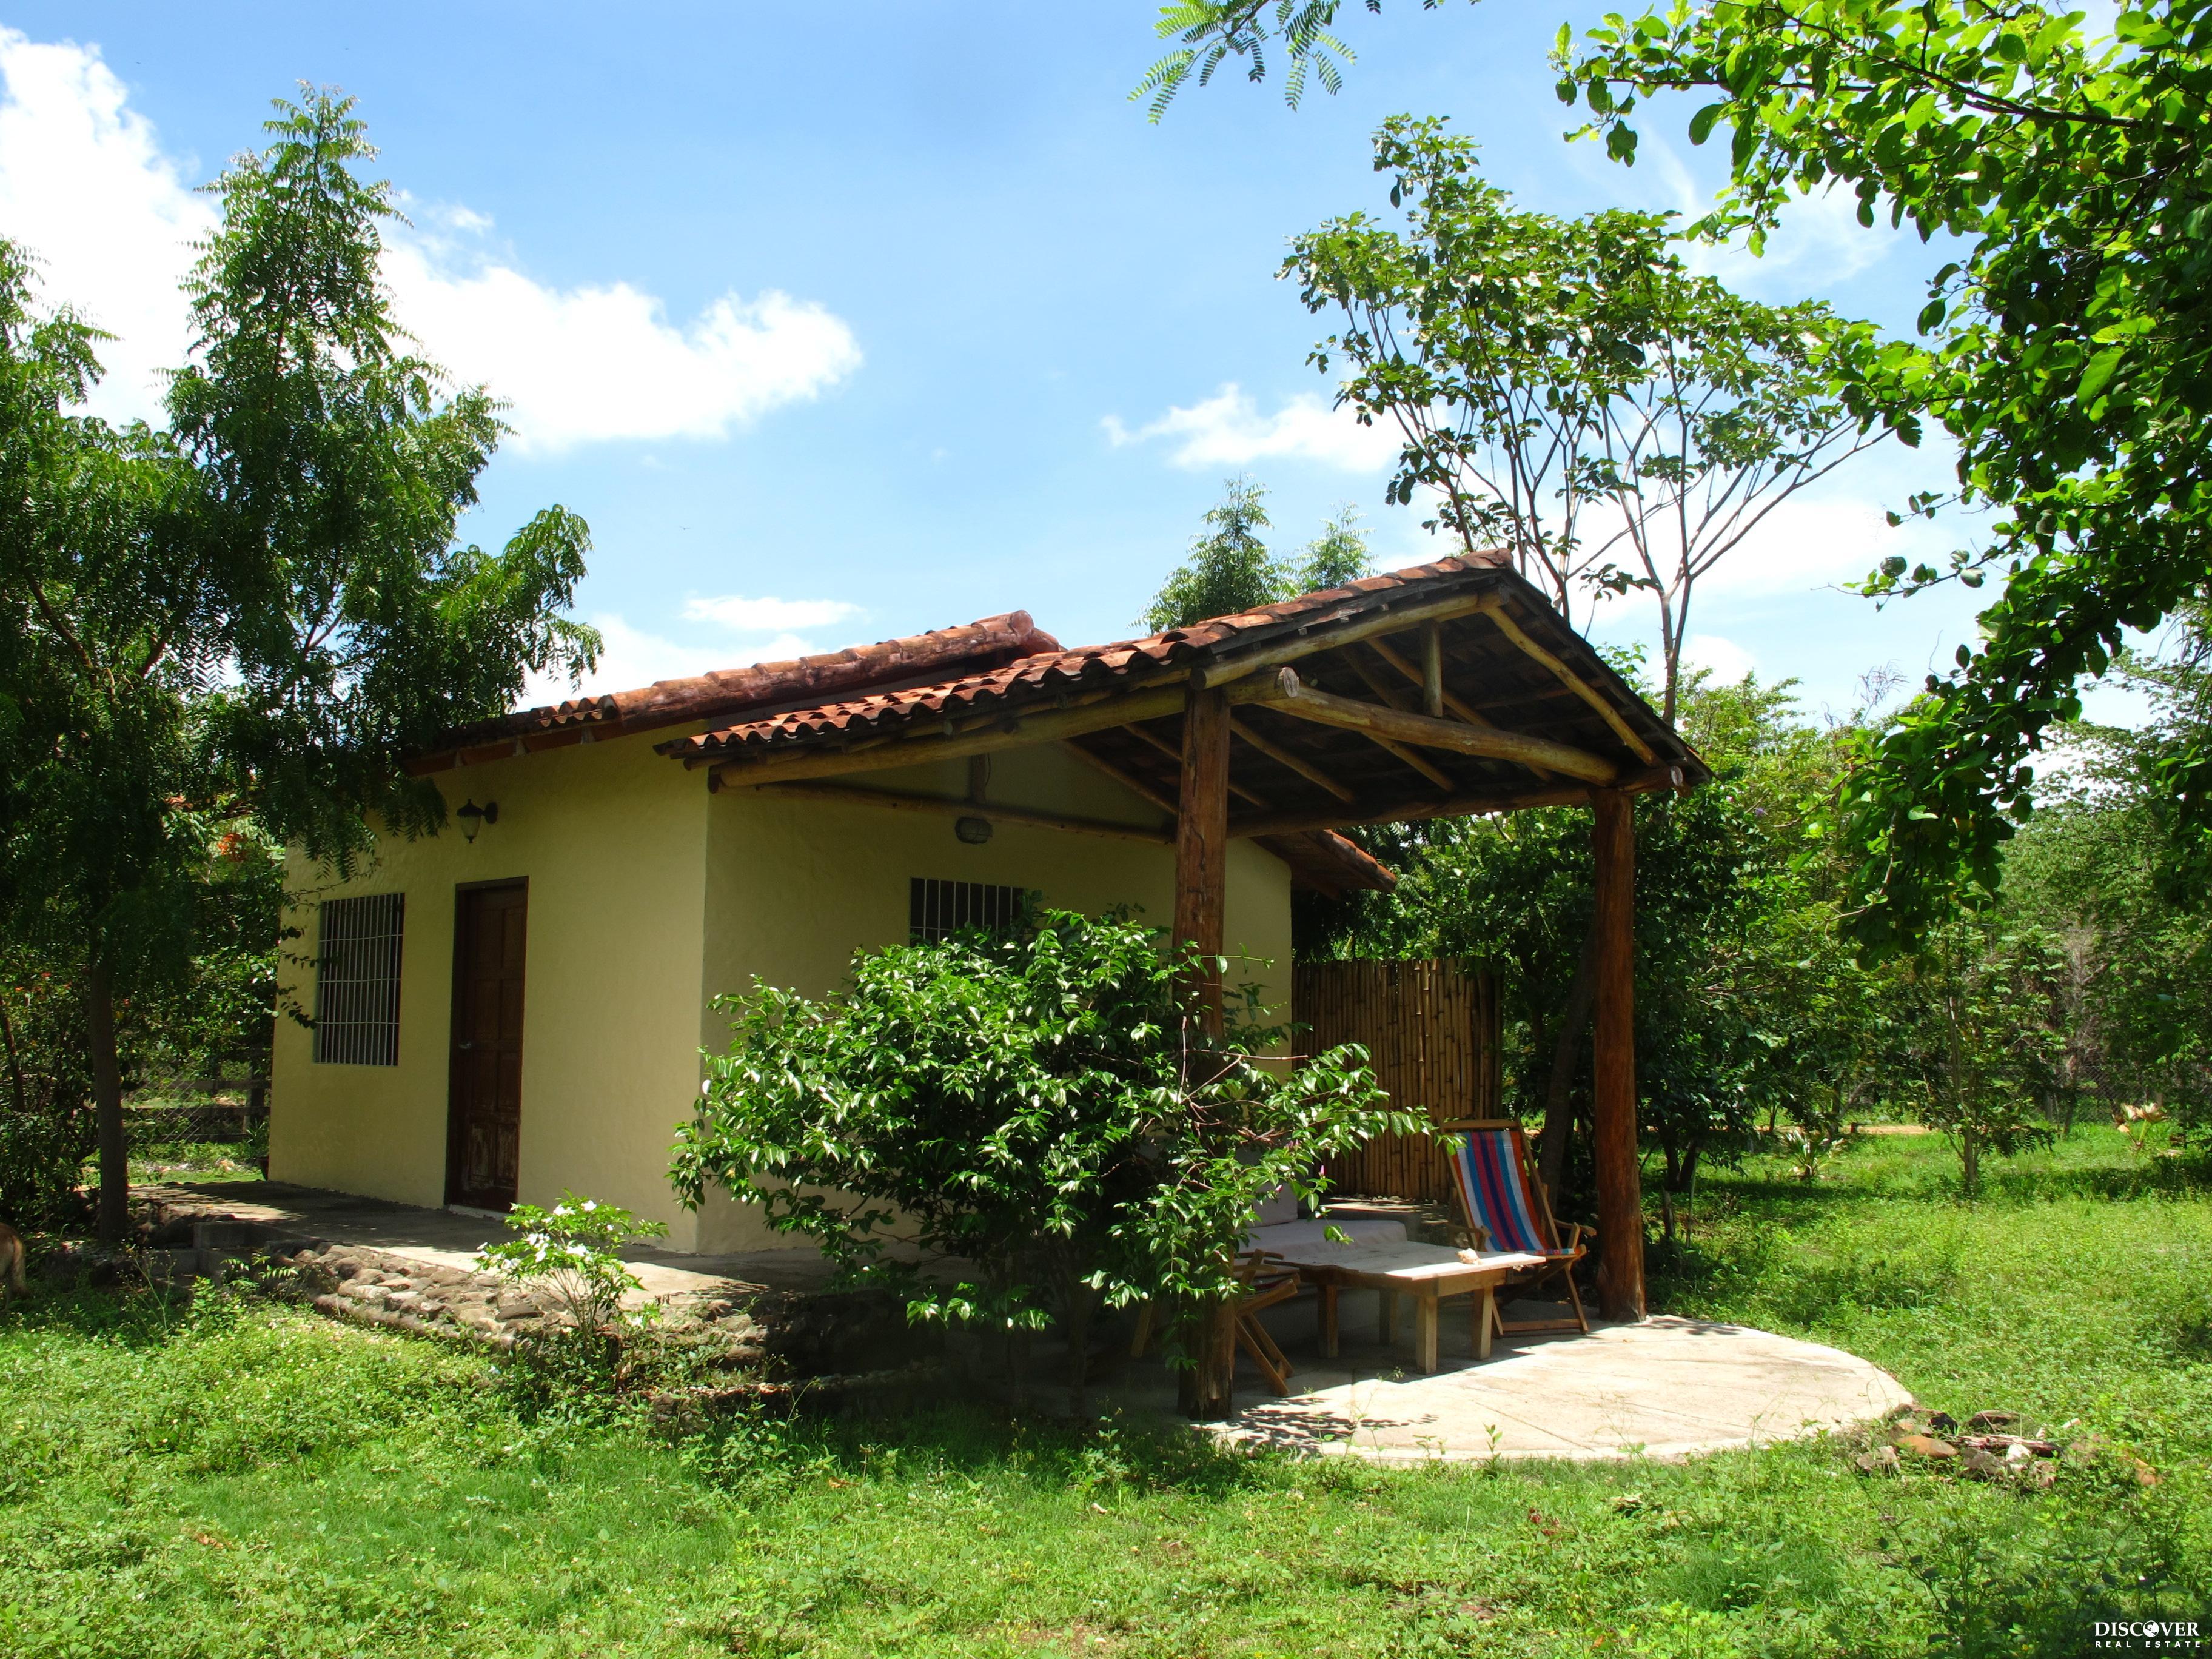 Vacation Studio on Expansive Playa Guasacate, Tola.